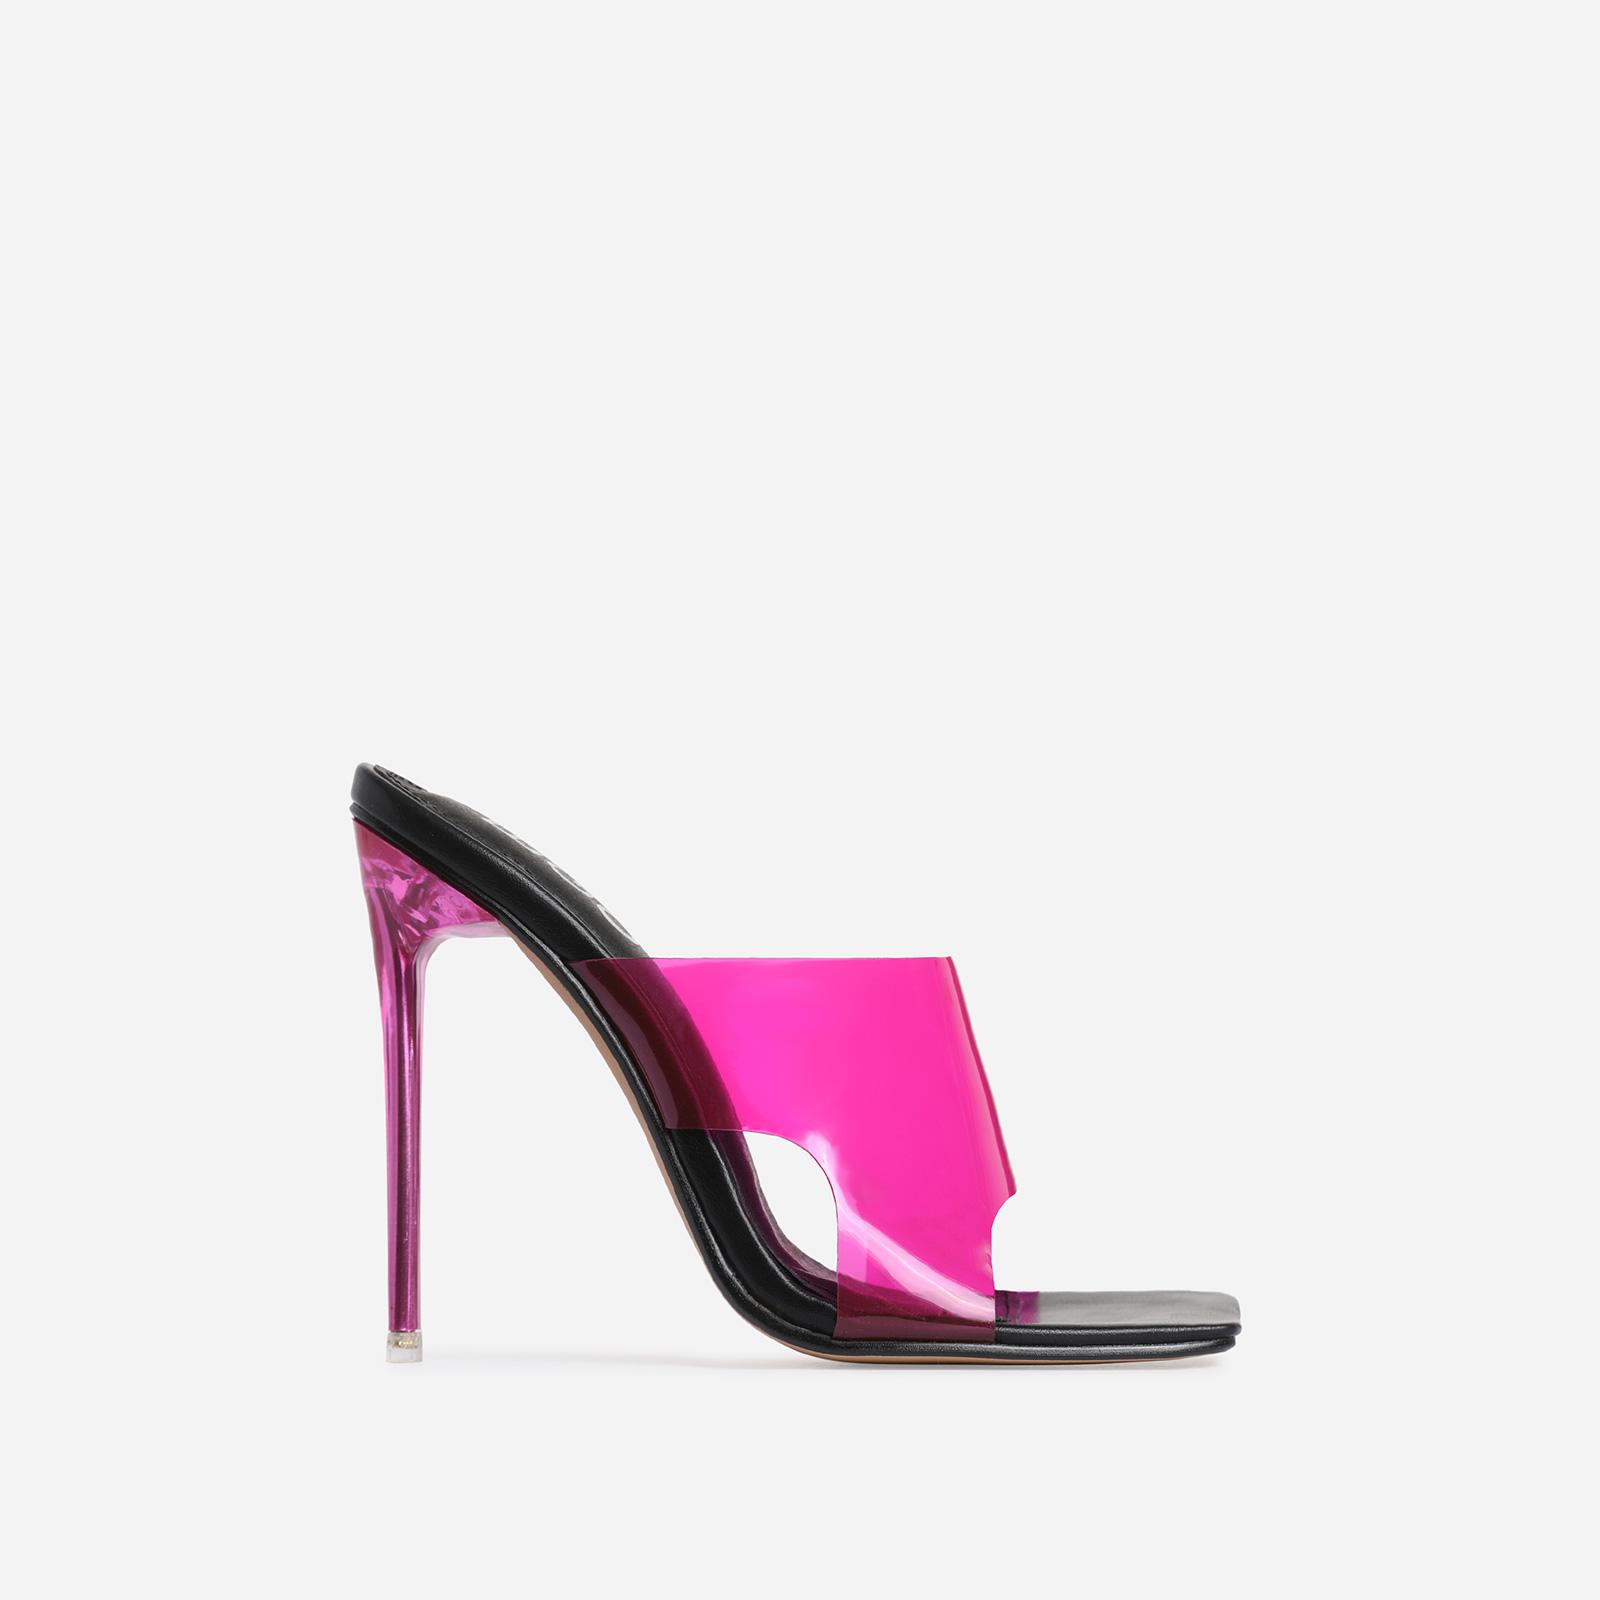 River Pink Perspex Square Peep Toe Heel Mule In Black Faux Leather